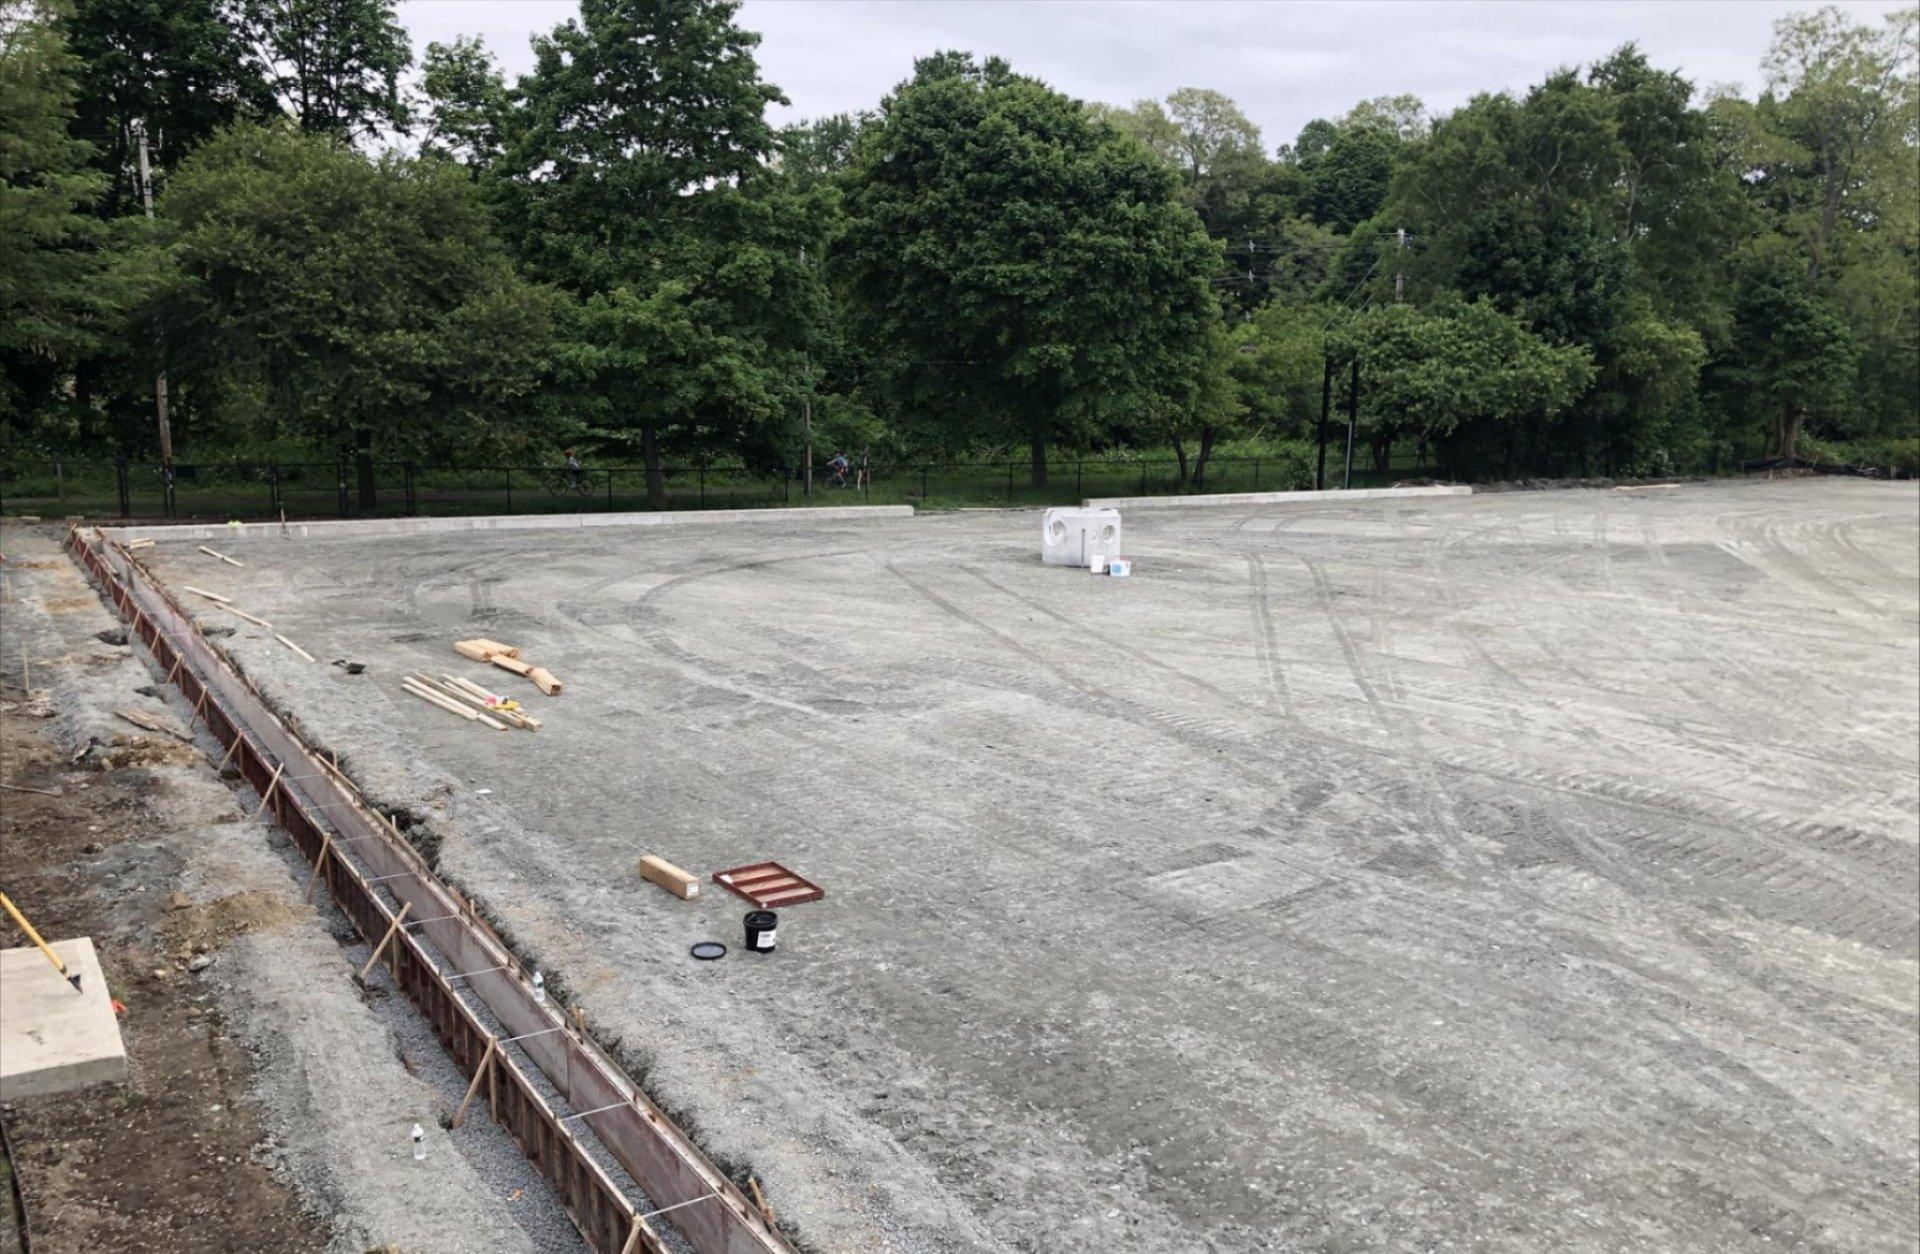 View of the turf field perimeter June 19, 2019